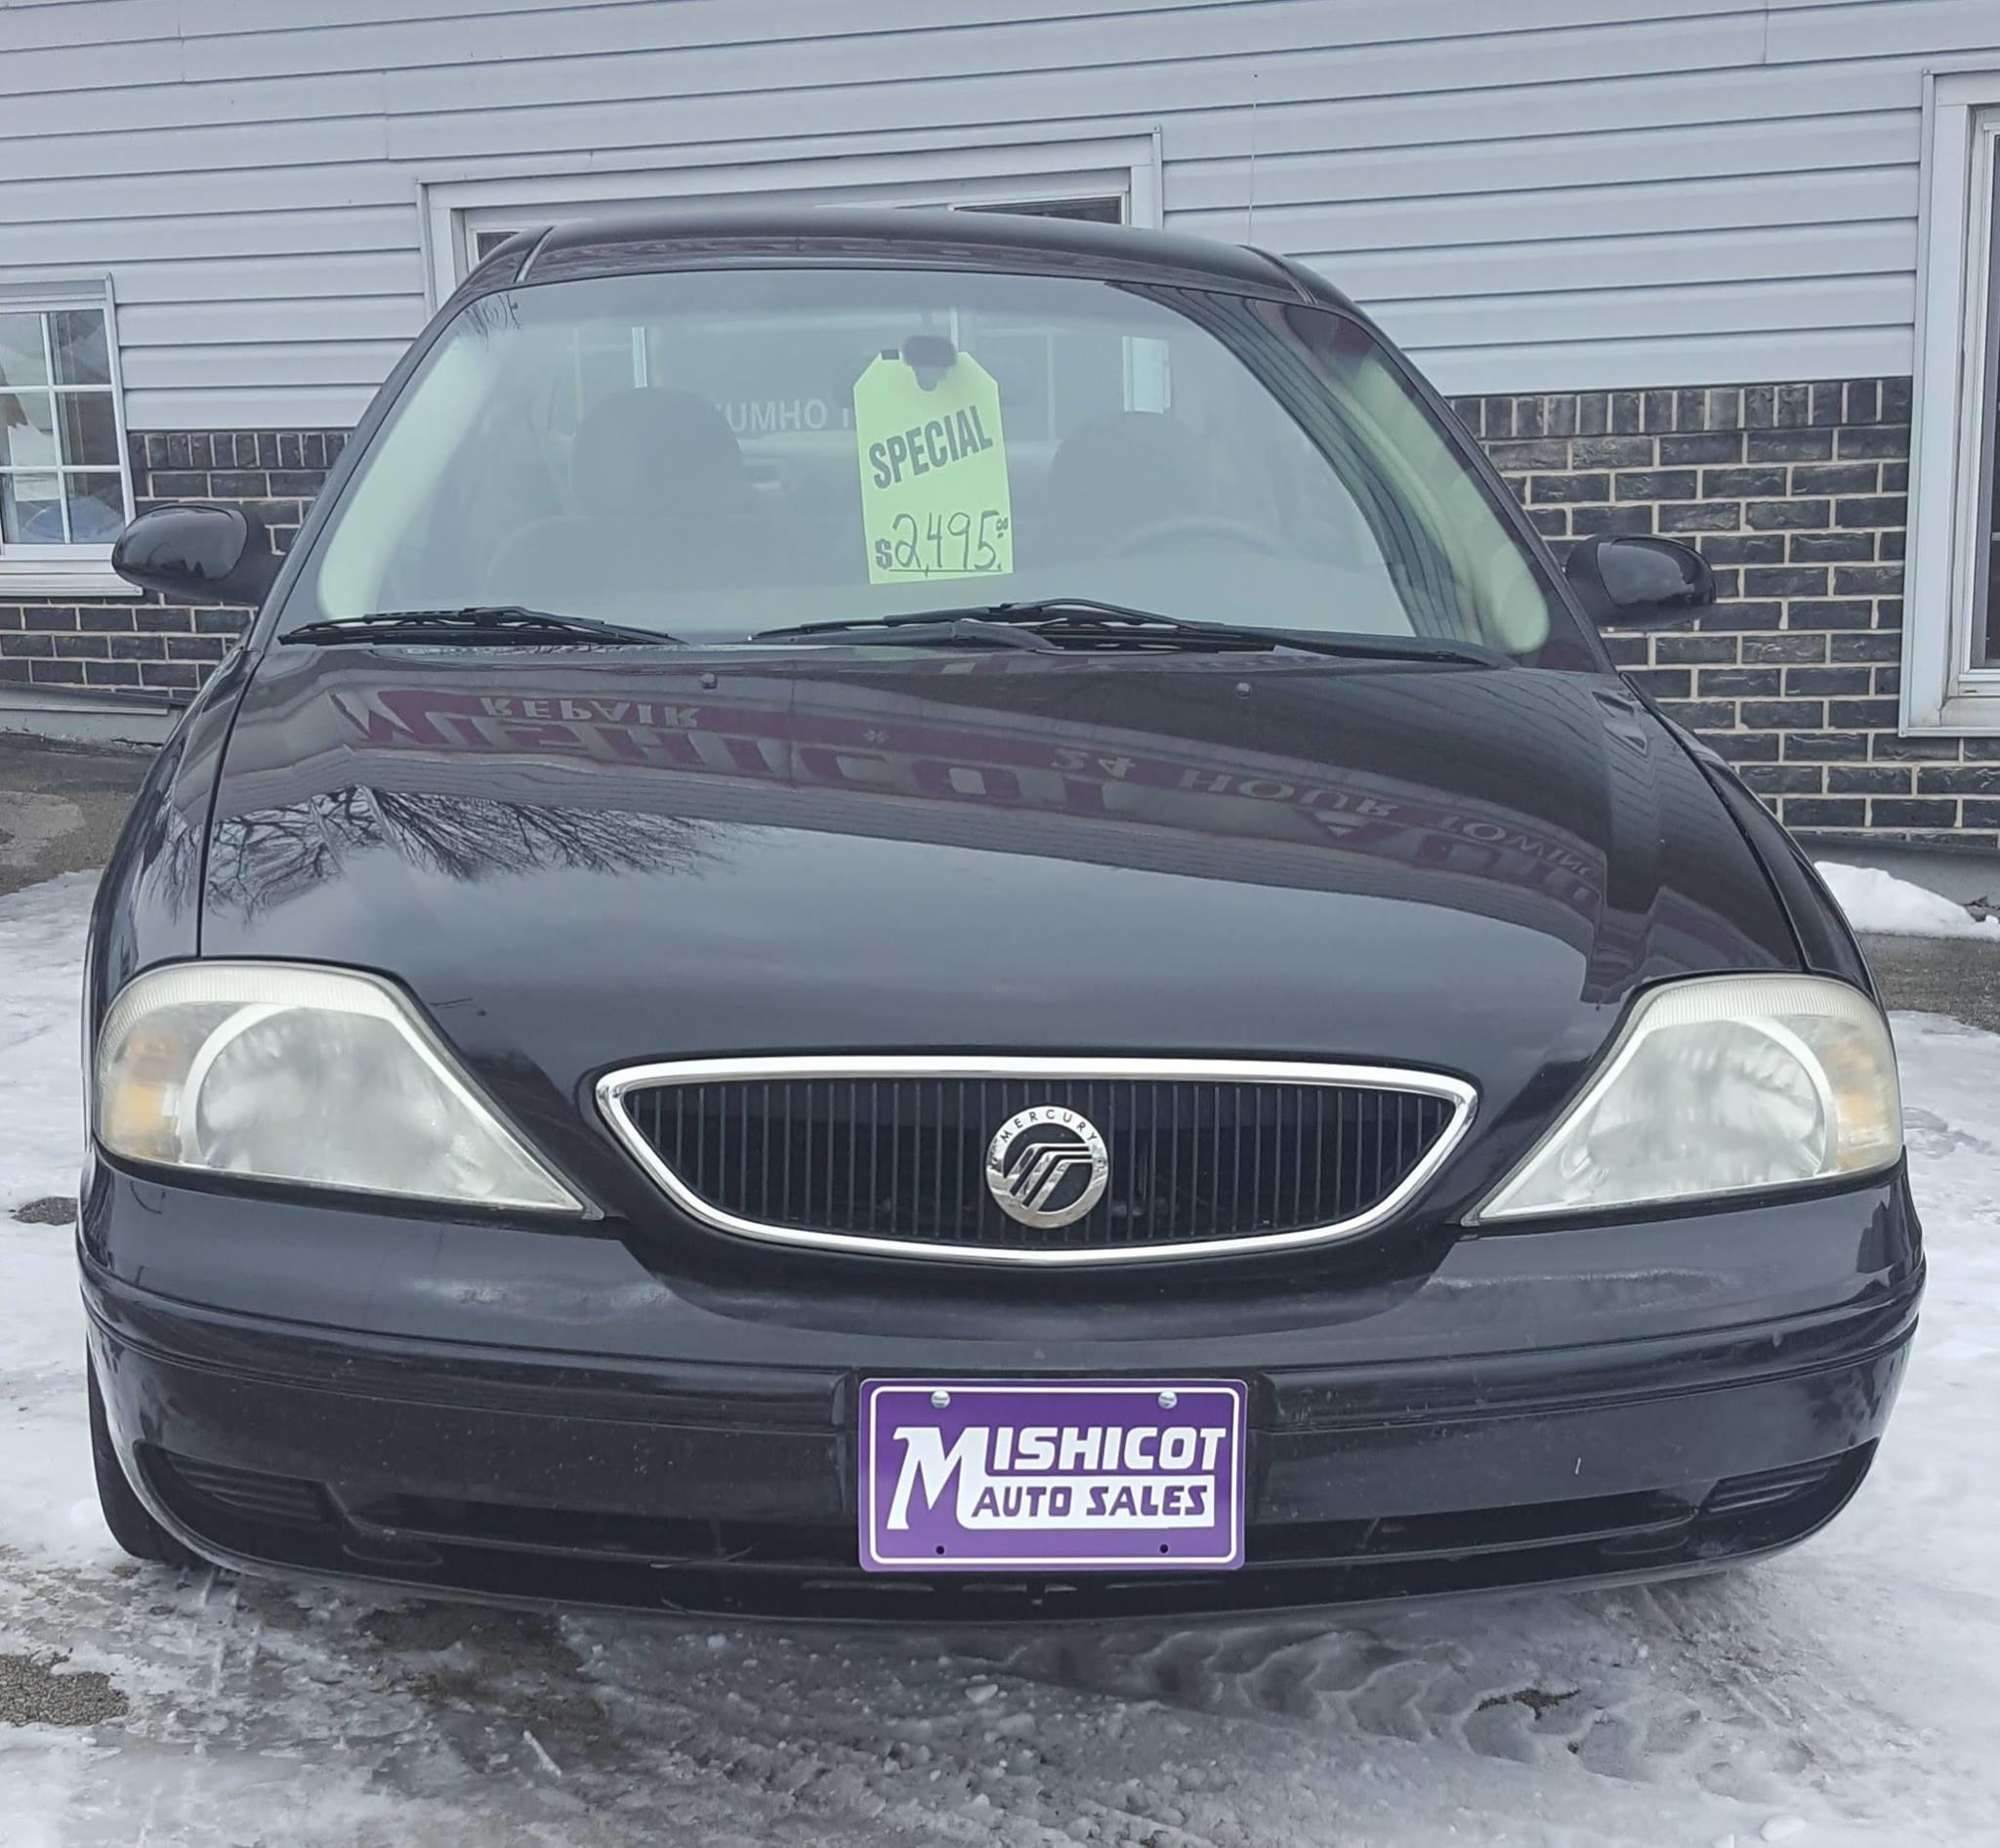 Mishicot Auto Sales LLC image 3